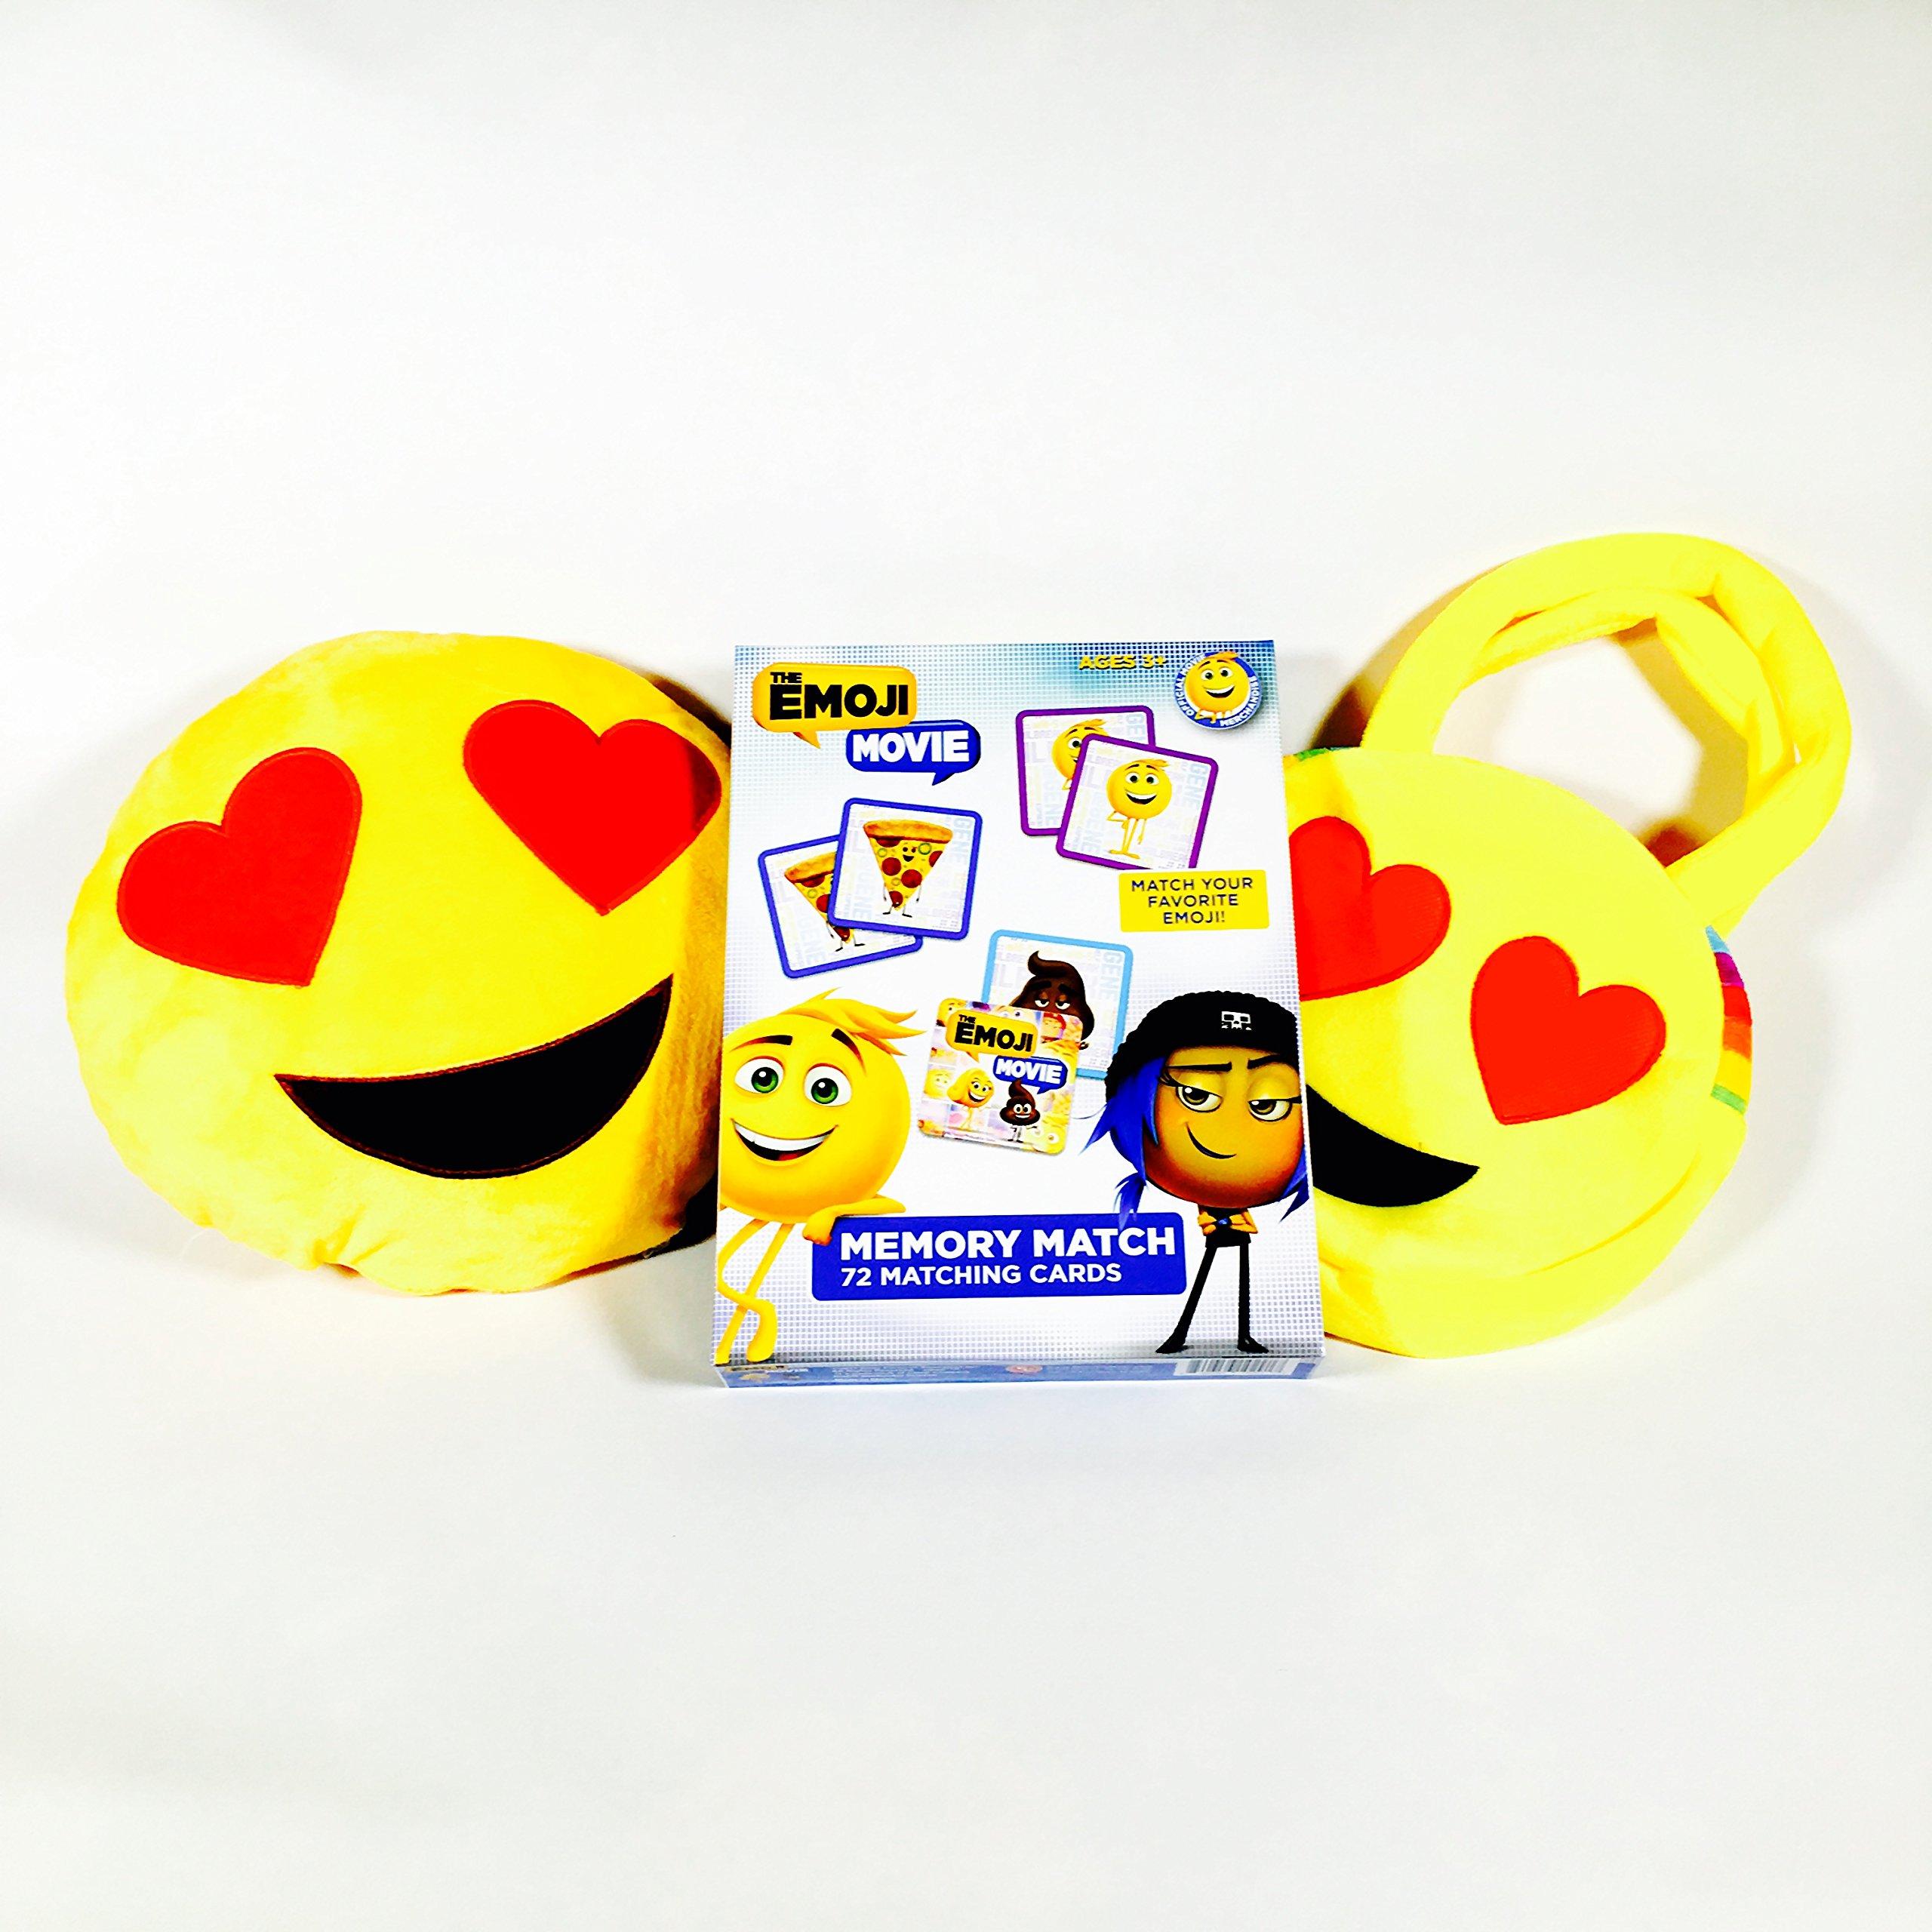 Emoji: Heart Eyes Speaker Pillow, Handbag, and Memory Match Card Game Bundle